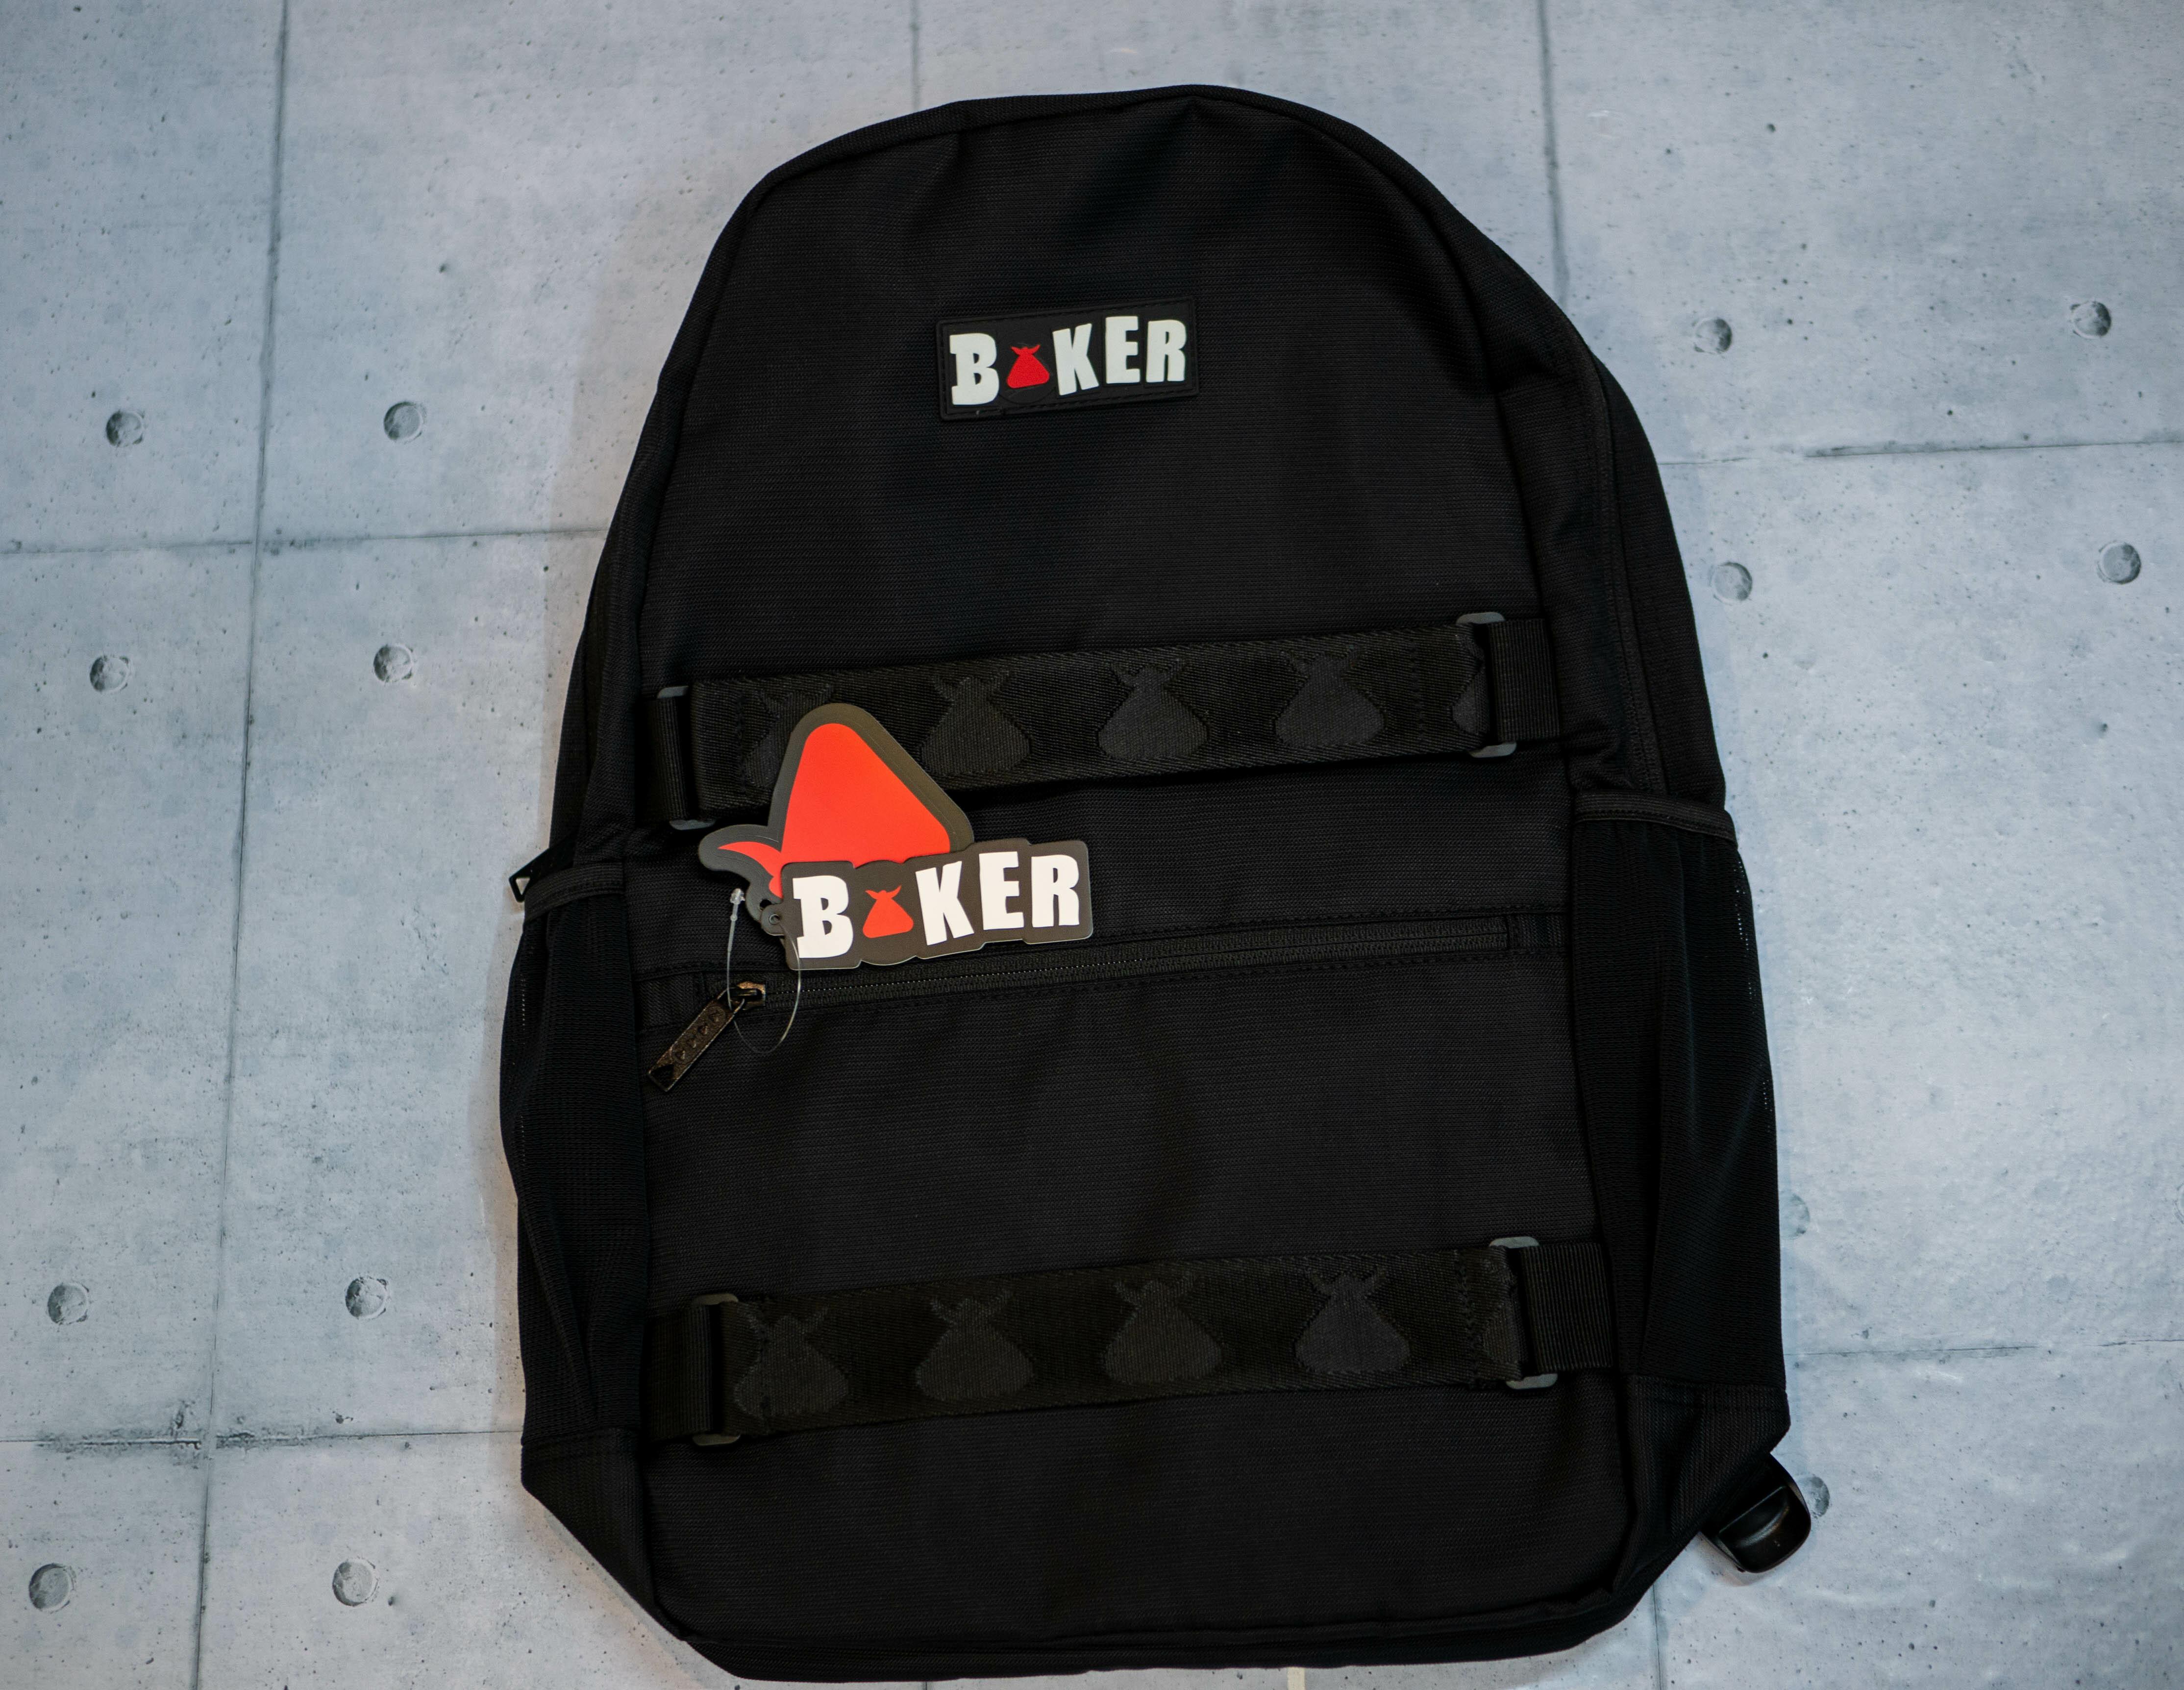 BUMBAG (バムバッグ) BAKER COMPACT SHOULDER BAG